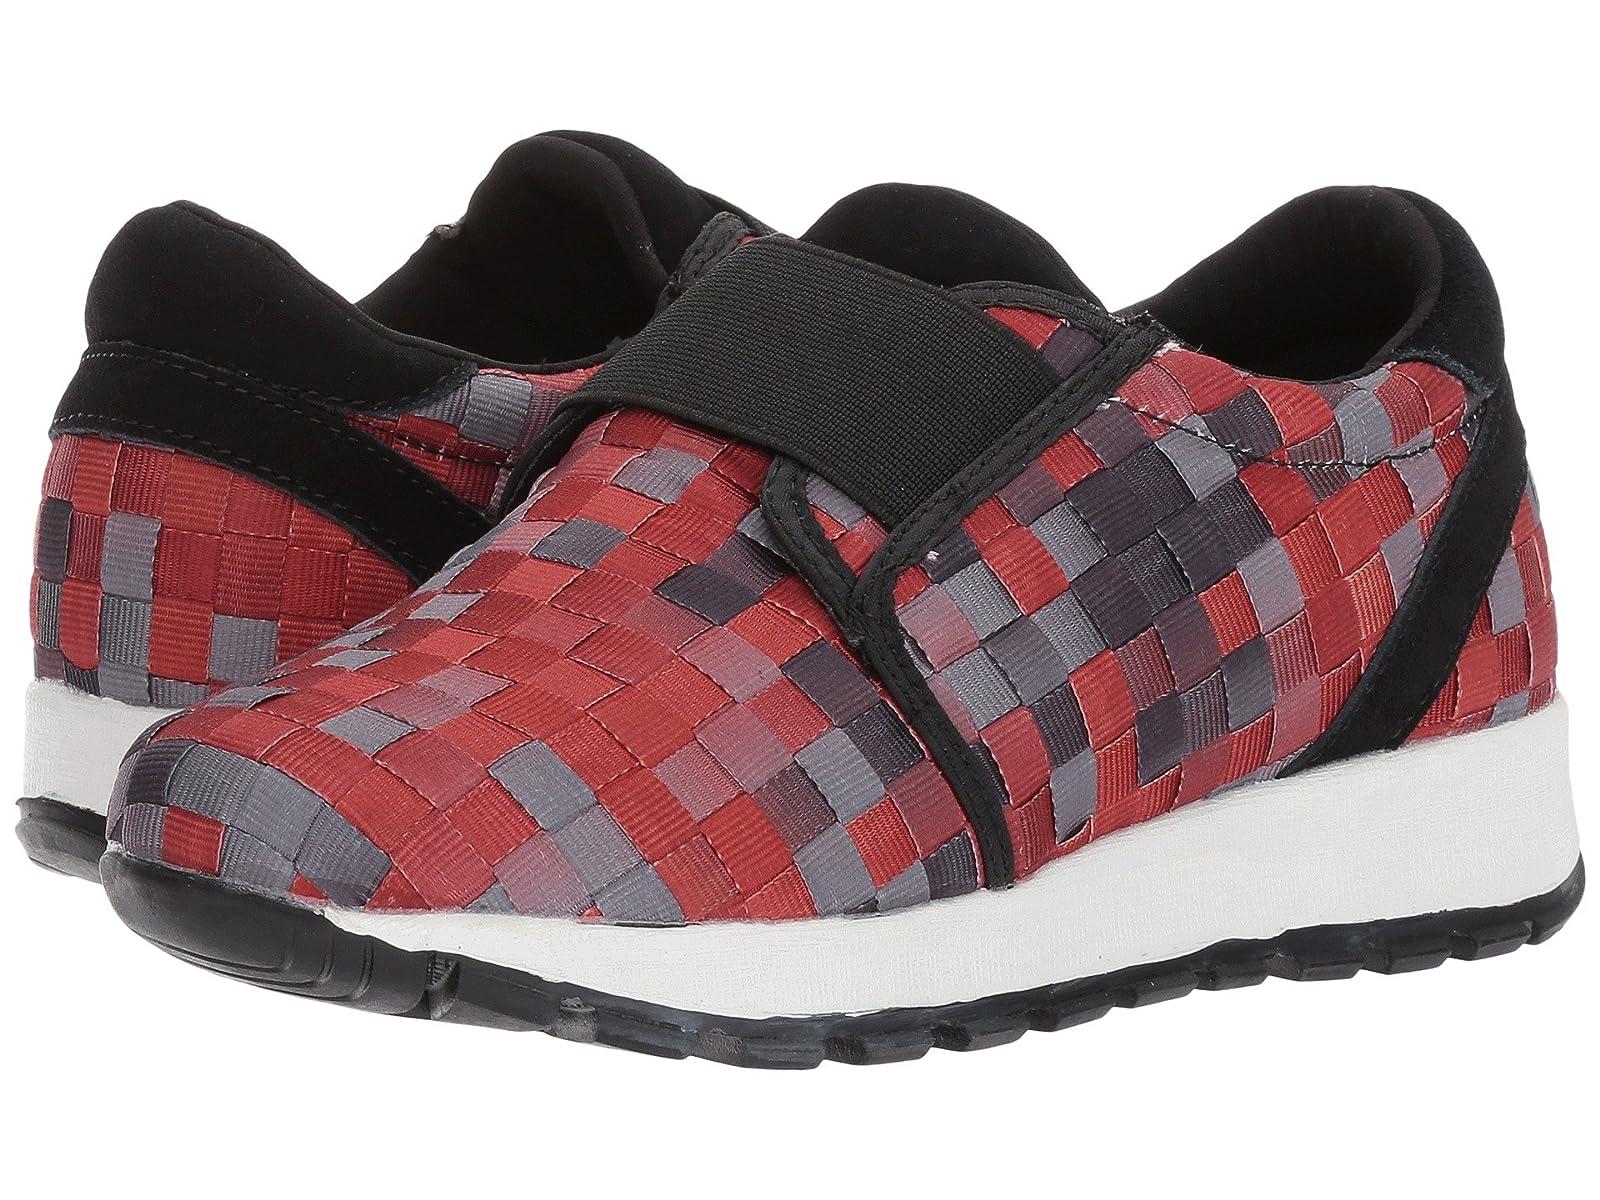 bernie mev. Best KarolineCheap and distinctive eye-catching shoes